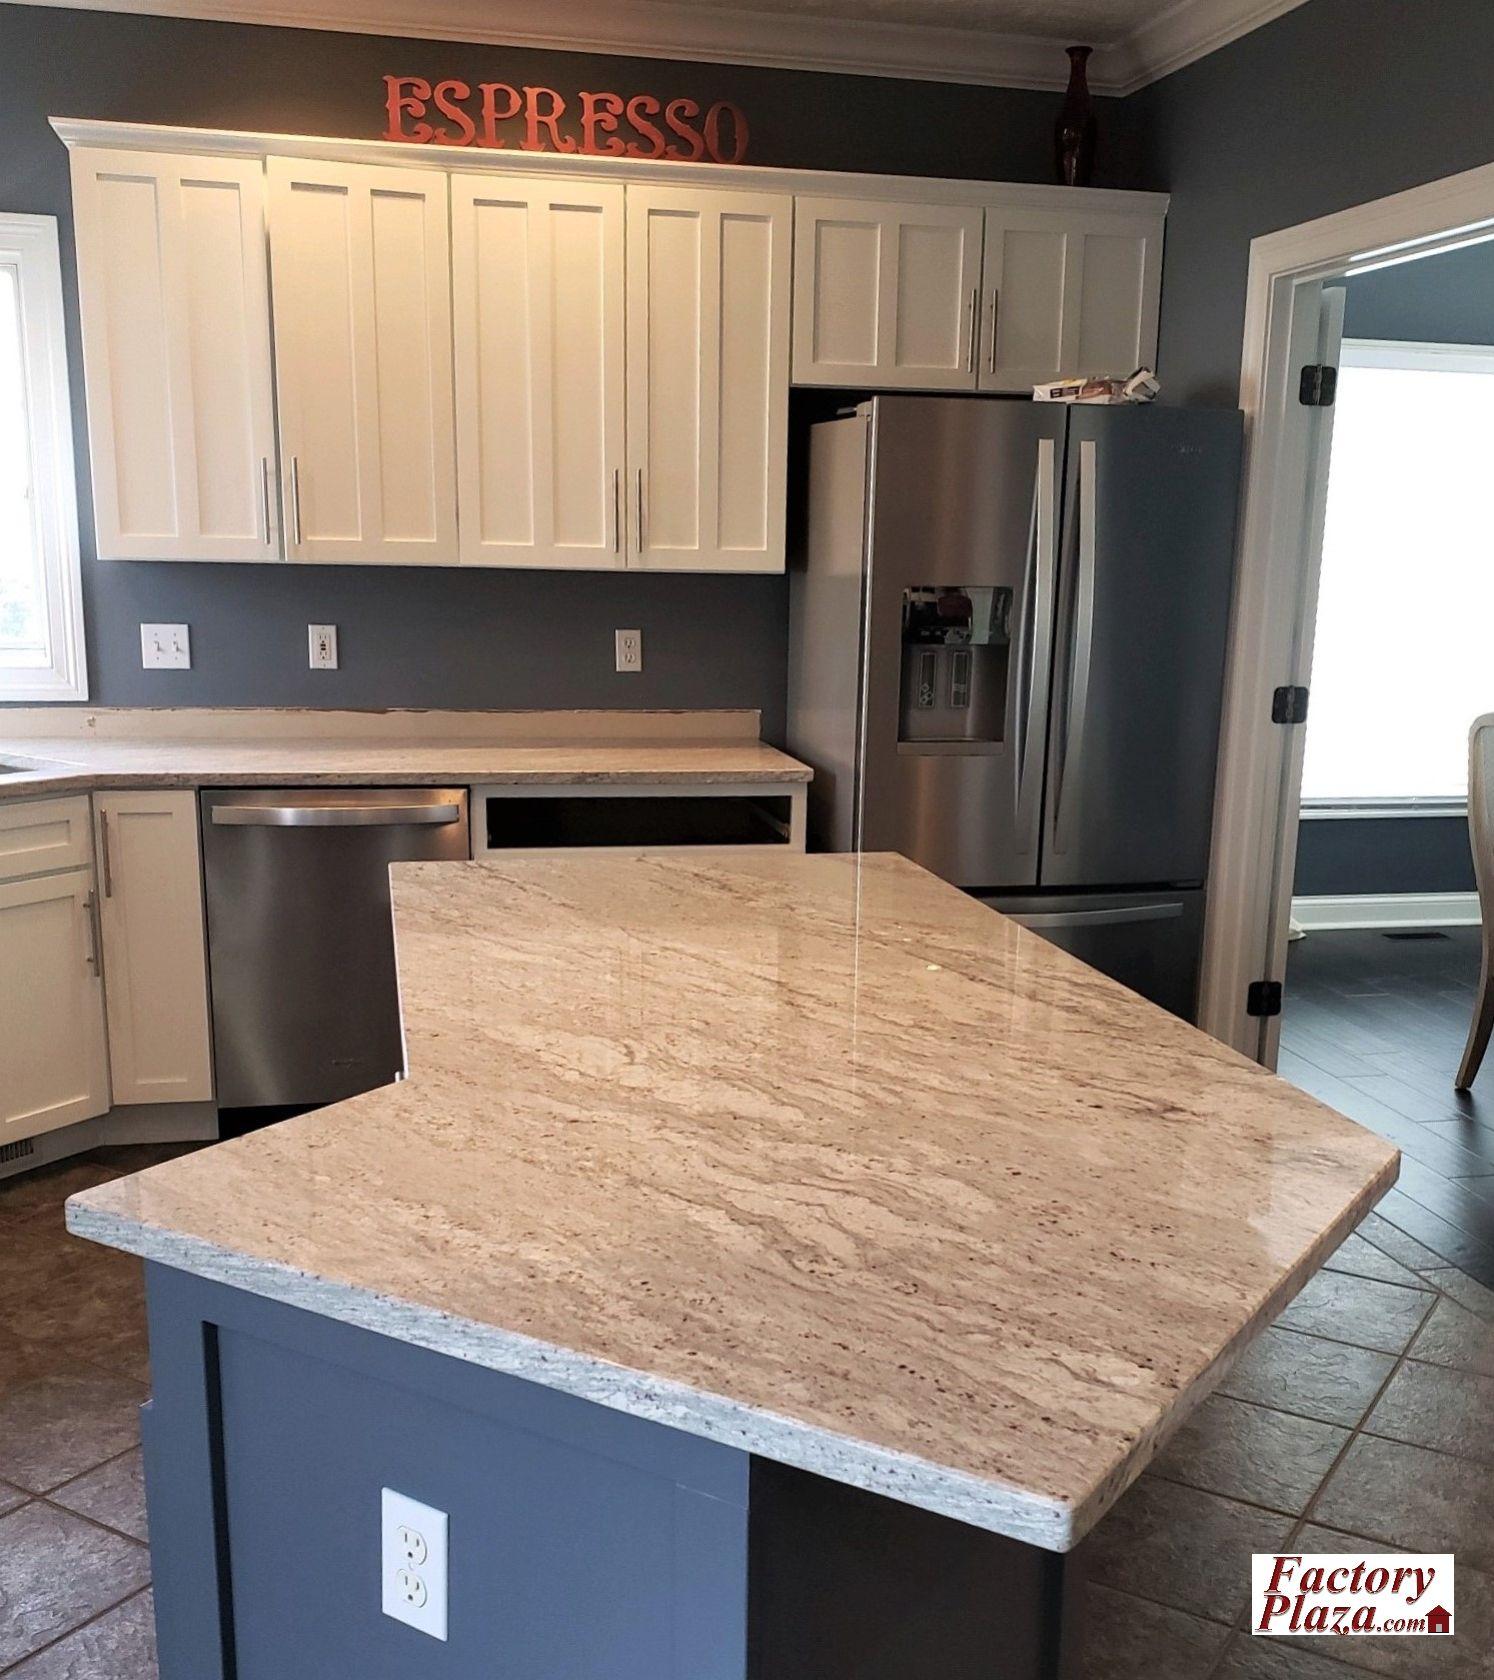 Factory Plaza Granite Kitchen in 2020 Countertops